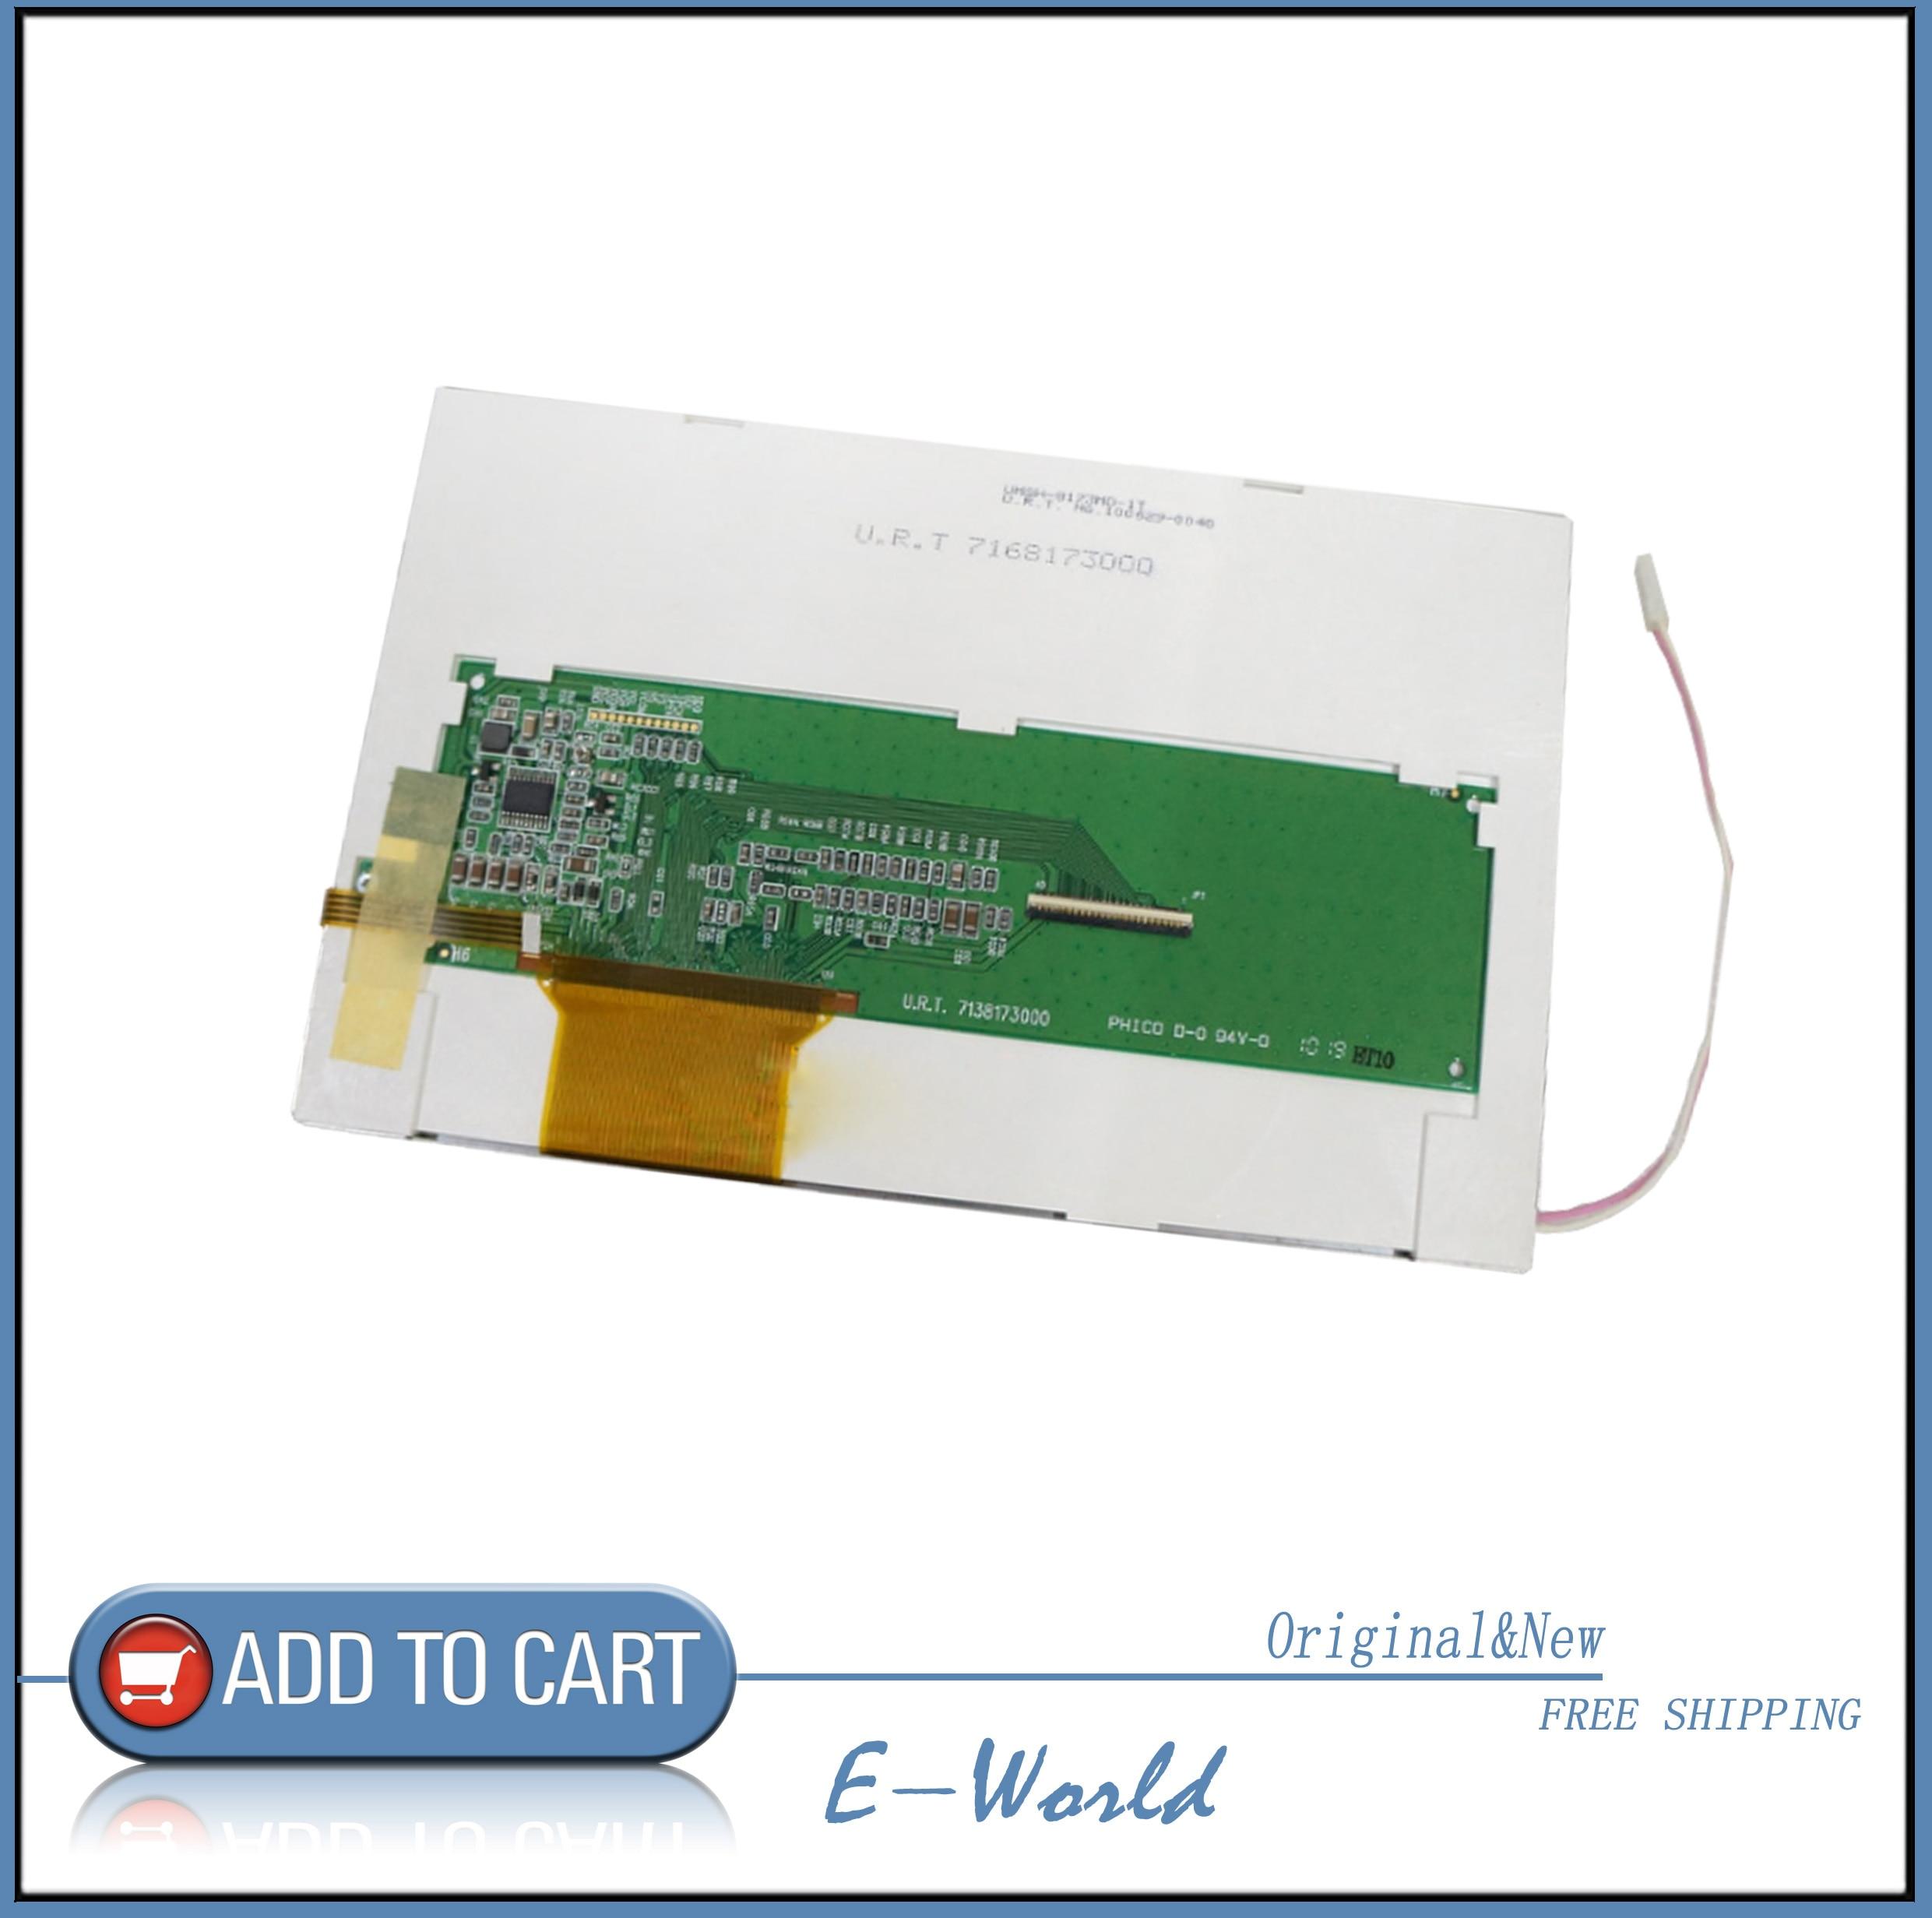 Original pantalla LCD de 7 pulgadas con pantalla táctil UMSH-8173MD-1T U.R.T NO.100629-0039 U.R.T 7168173000 envío gratis